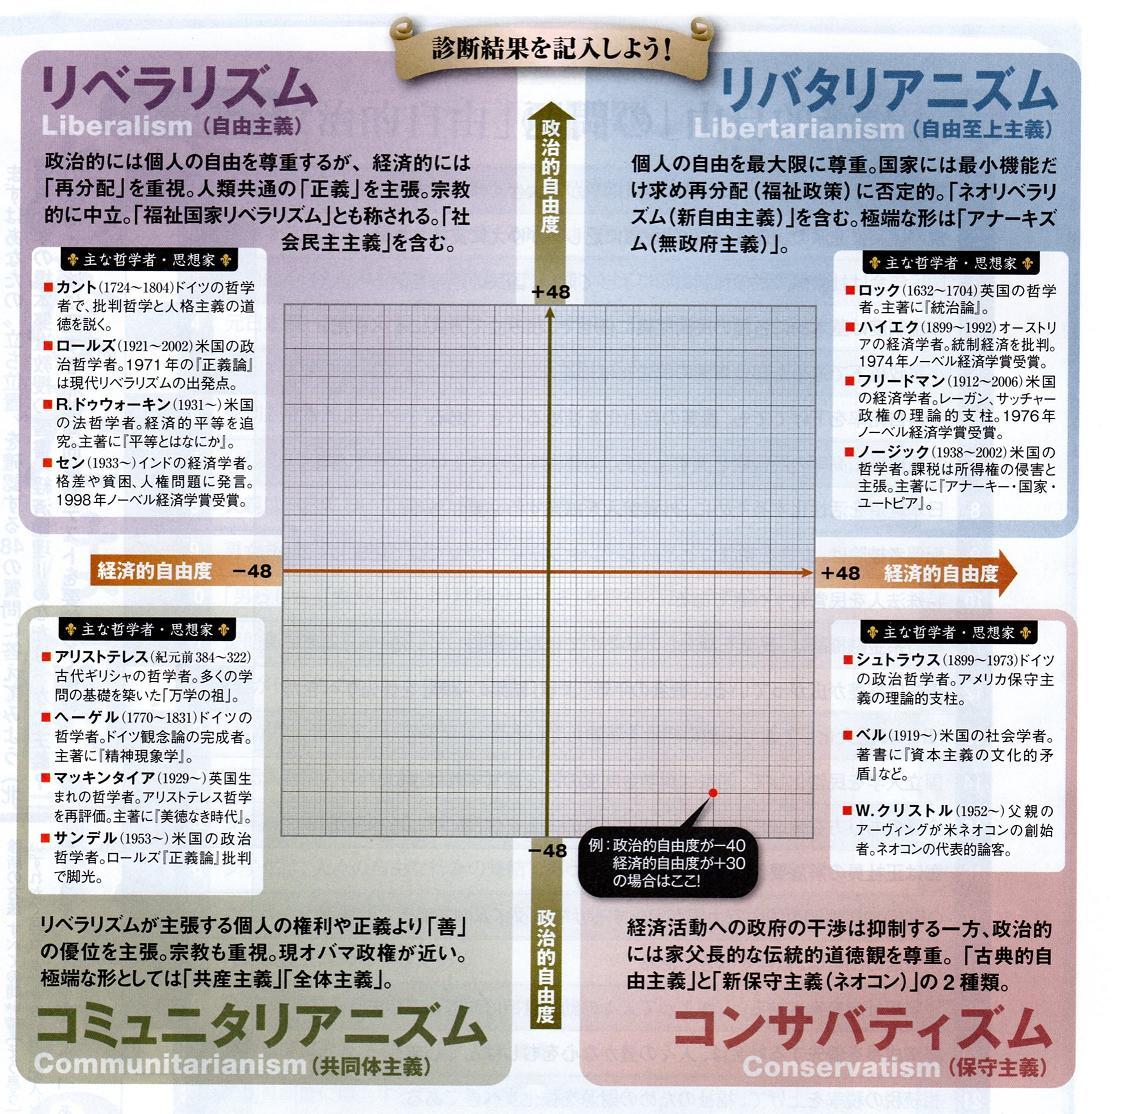 http://livedoor.blogimg.jp/yaori/imgs/5/7/573d063b.jpg